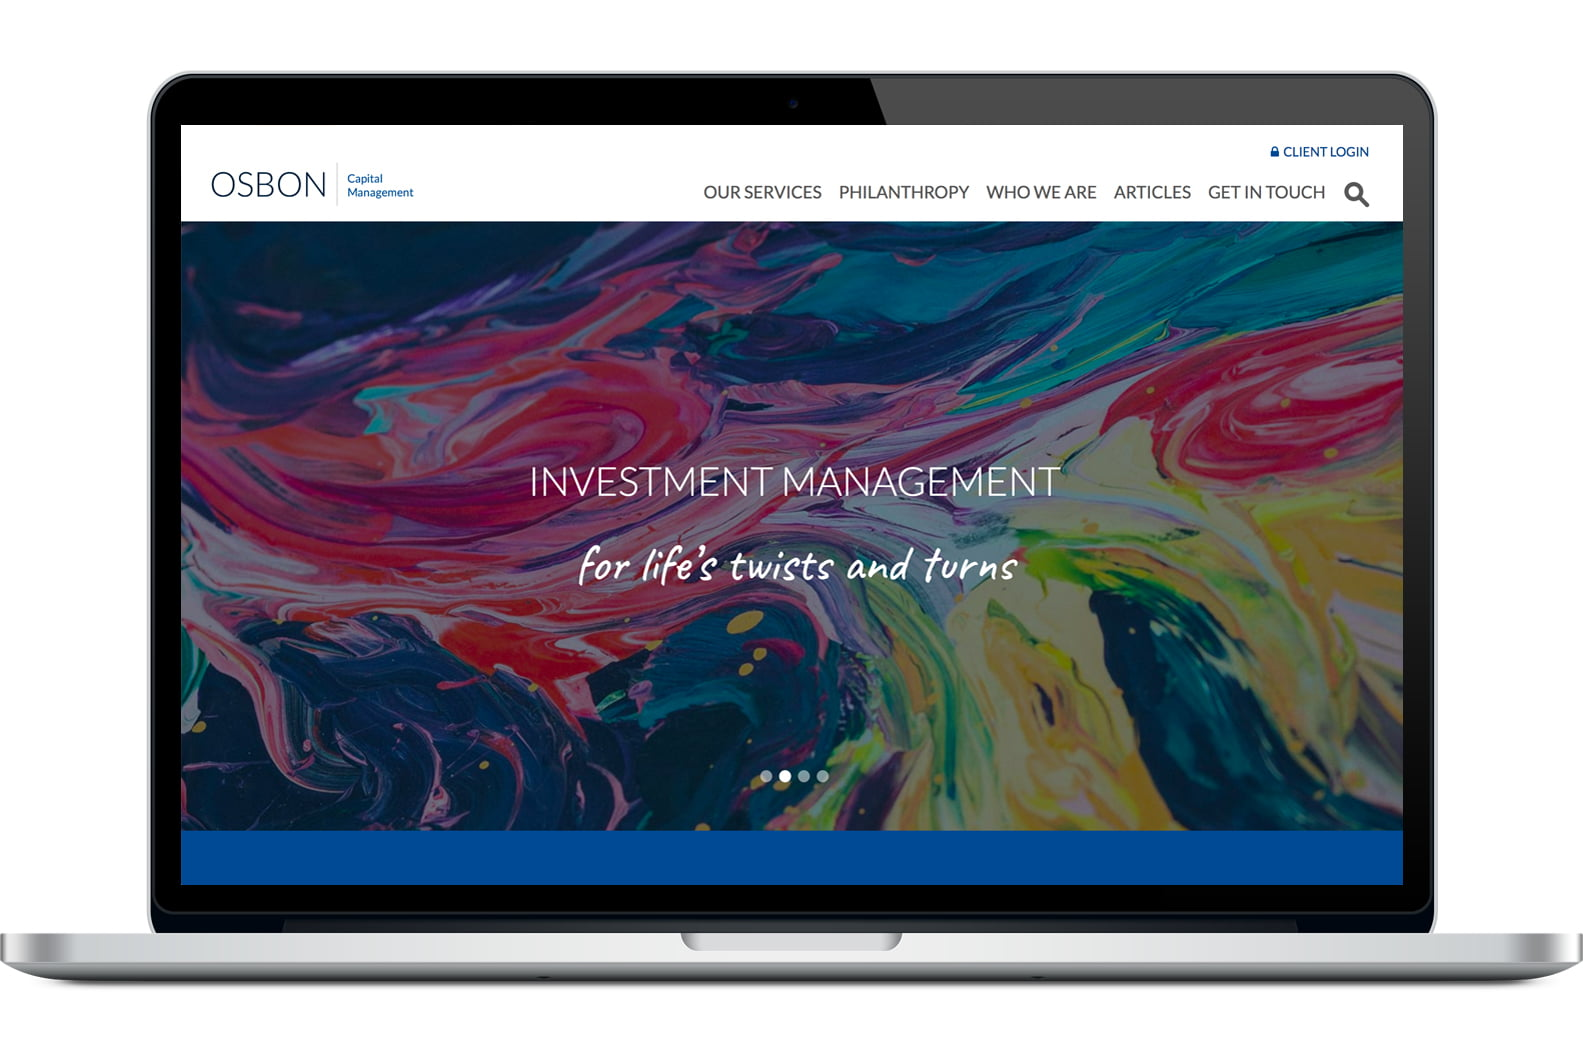 Osbon Website After